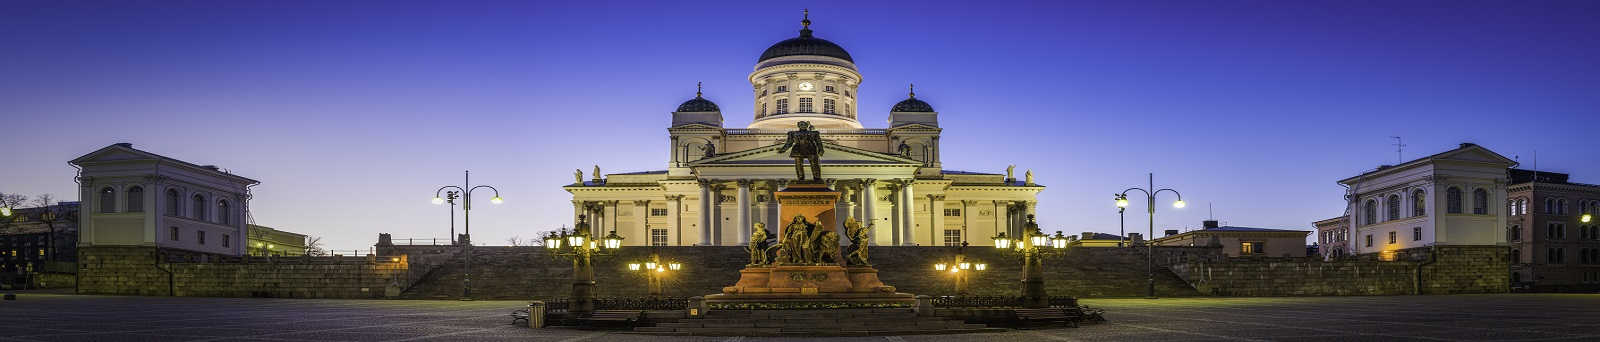 http://finland.taplowgroup.comFinland